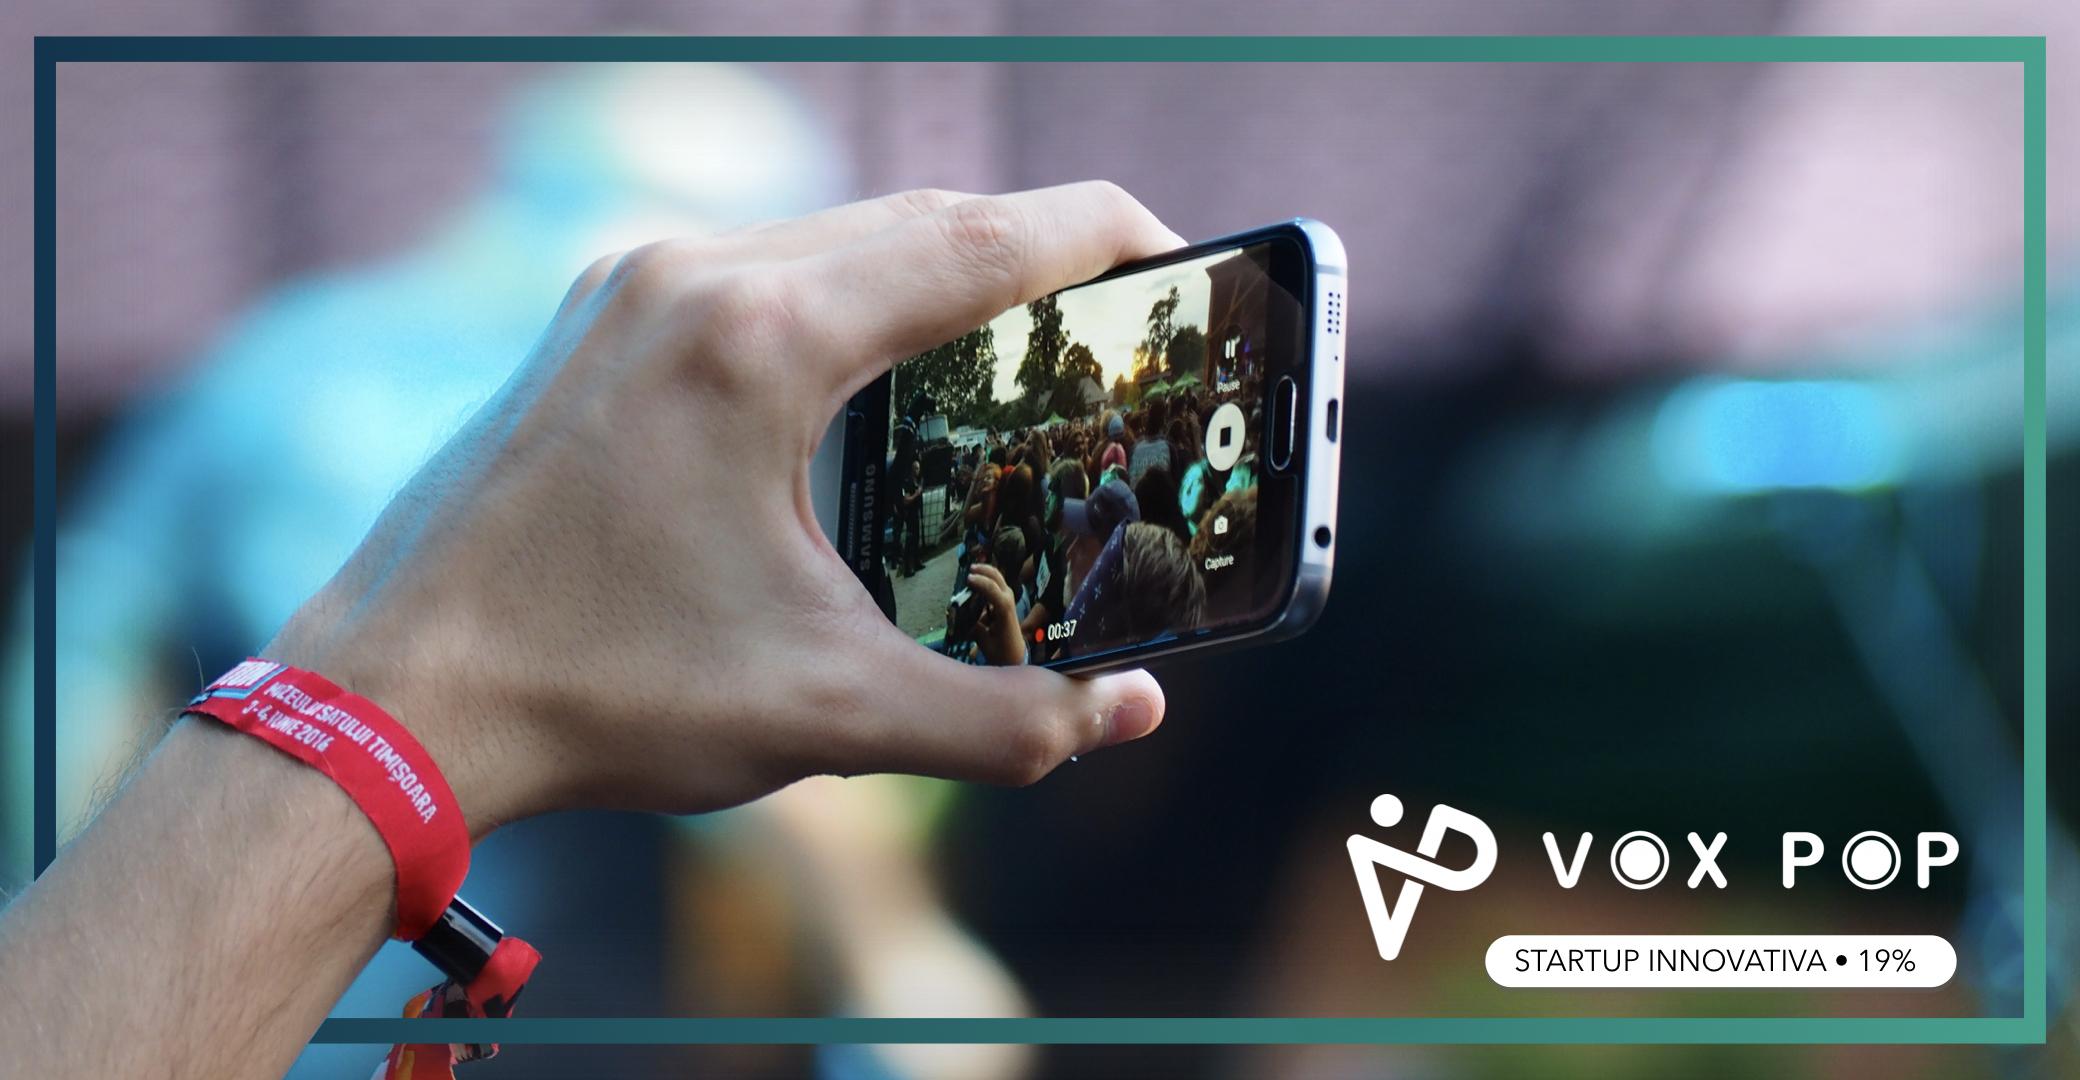 media-vox-pop-crowdfunding